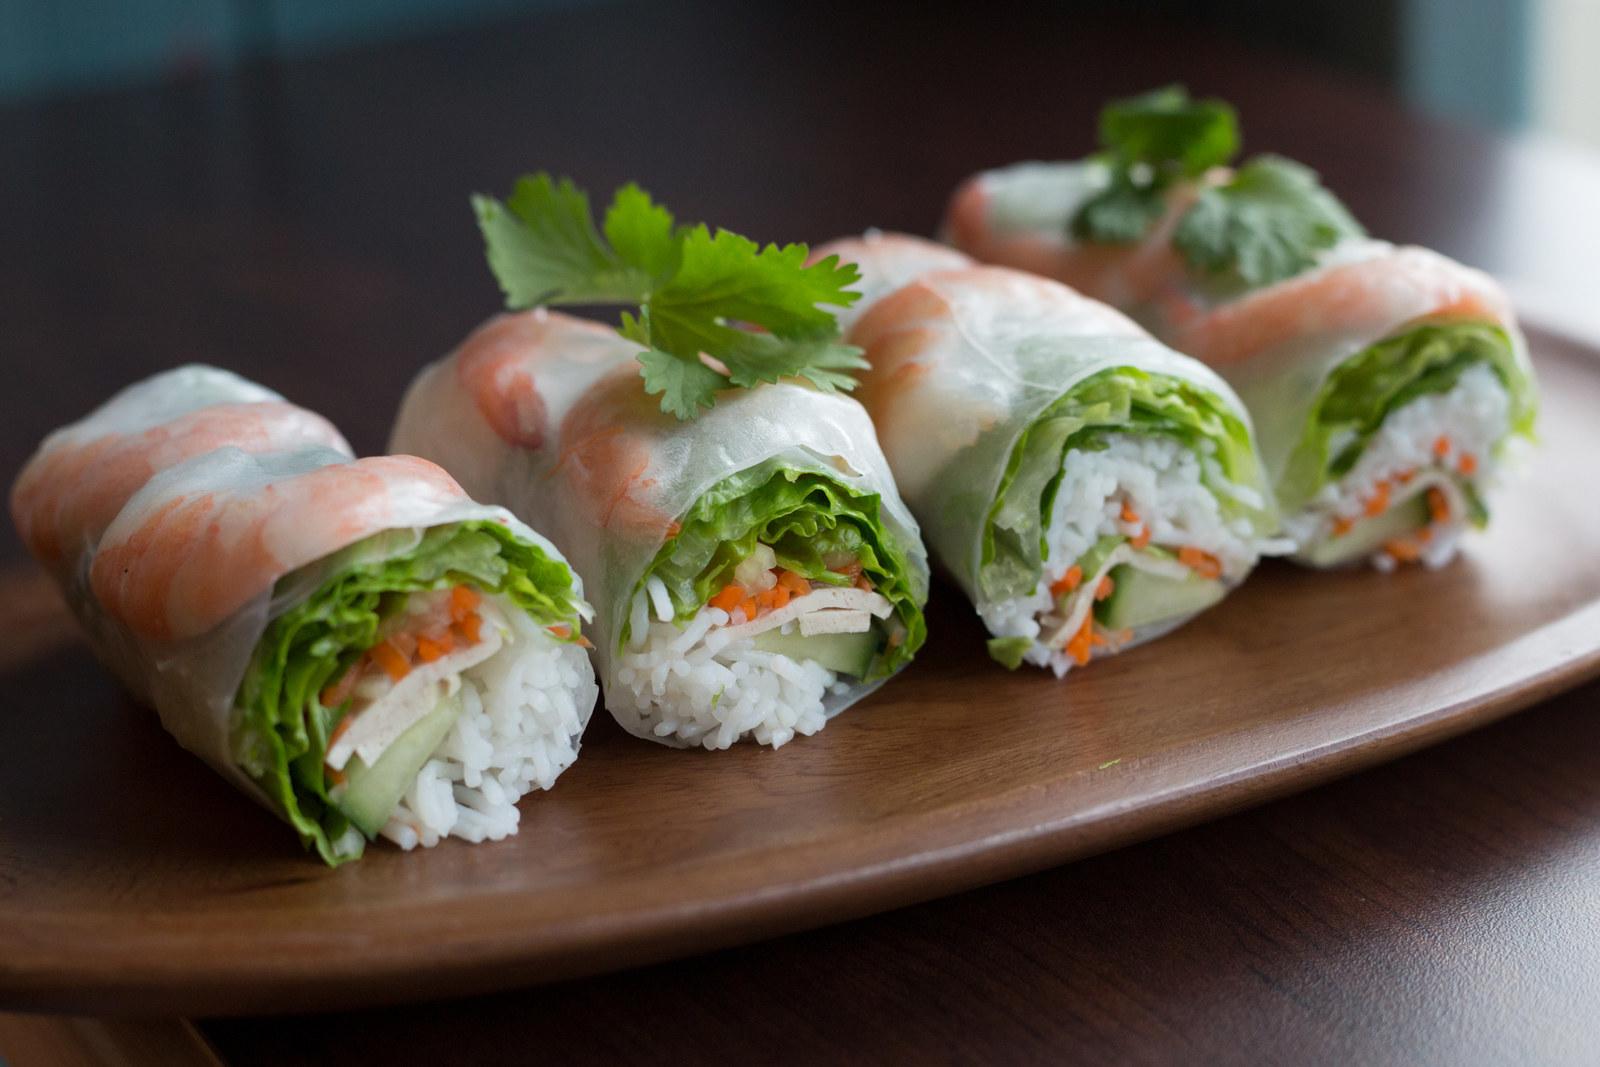 Most popular order: Thai spring rolls